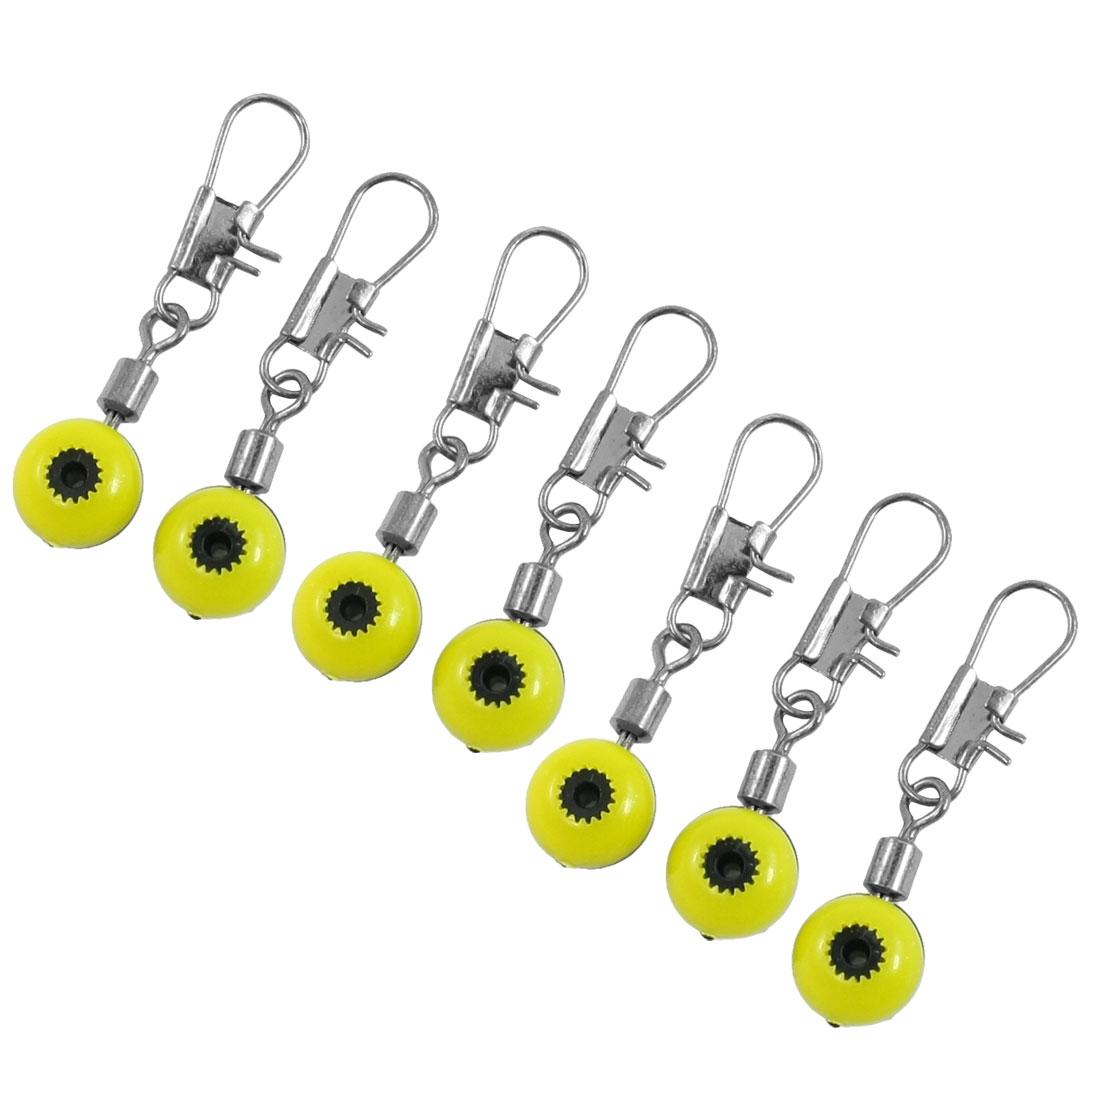 7 Pcs 1mm Diameter Eye Interlocking Fishing Crane Swivel Yellow Black